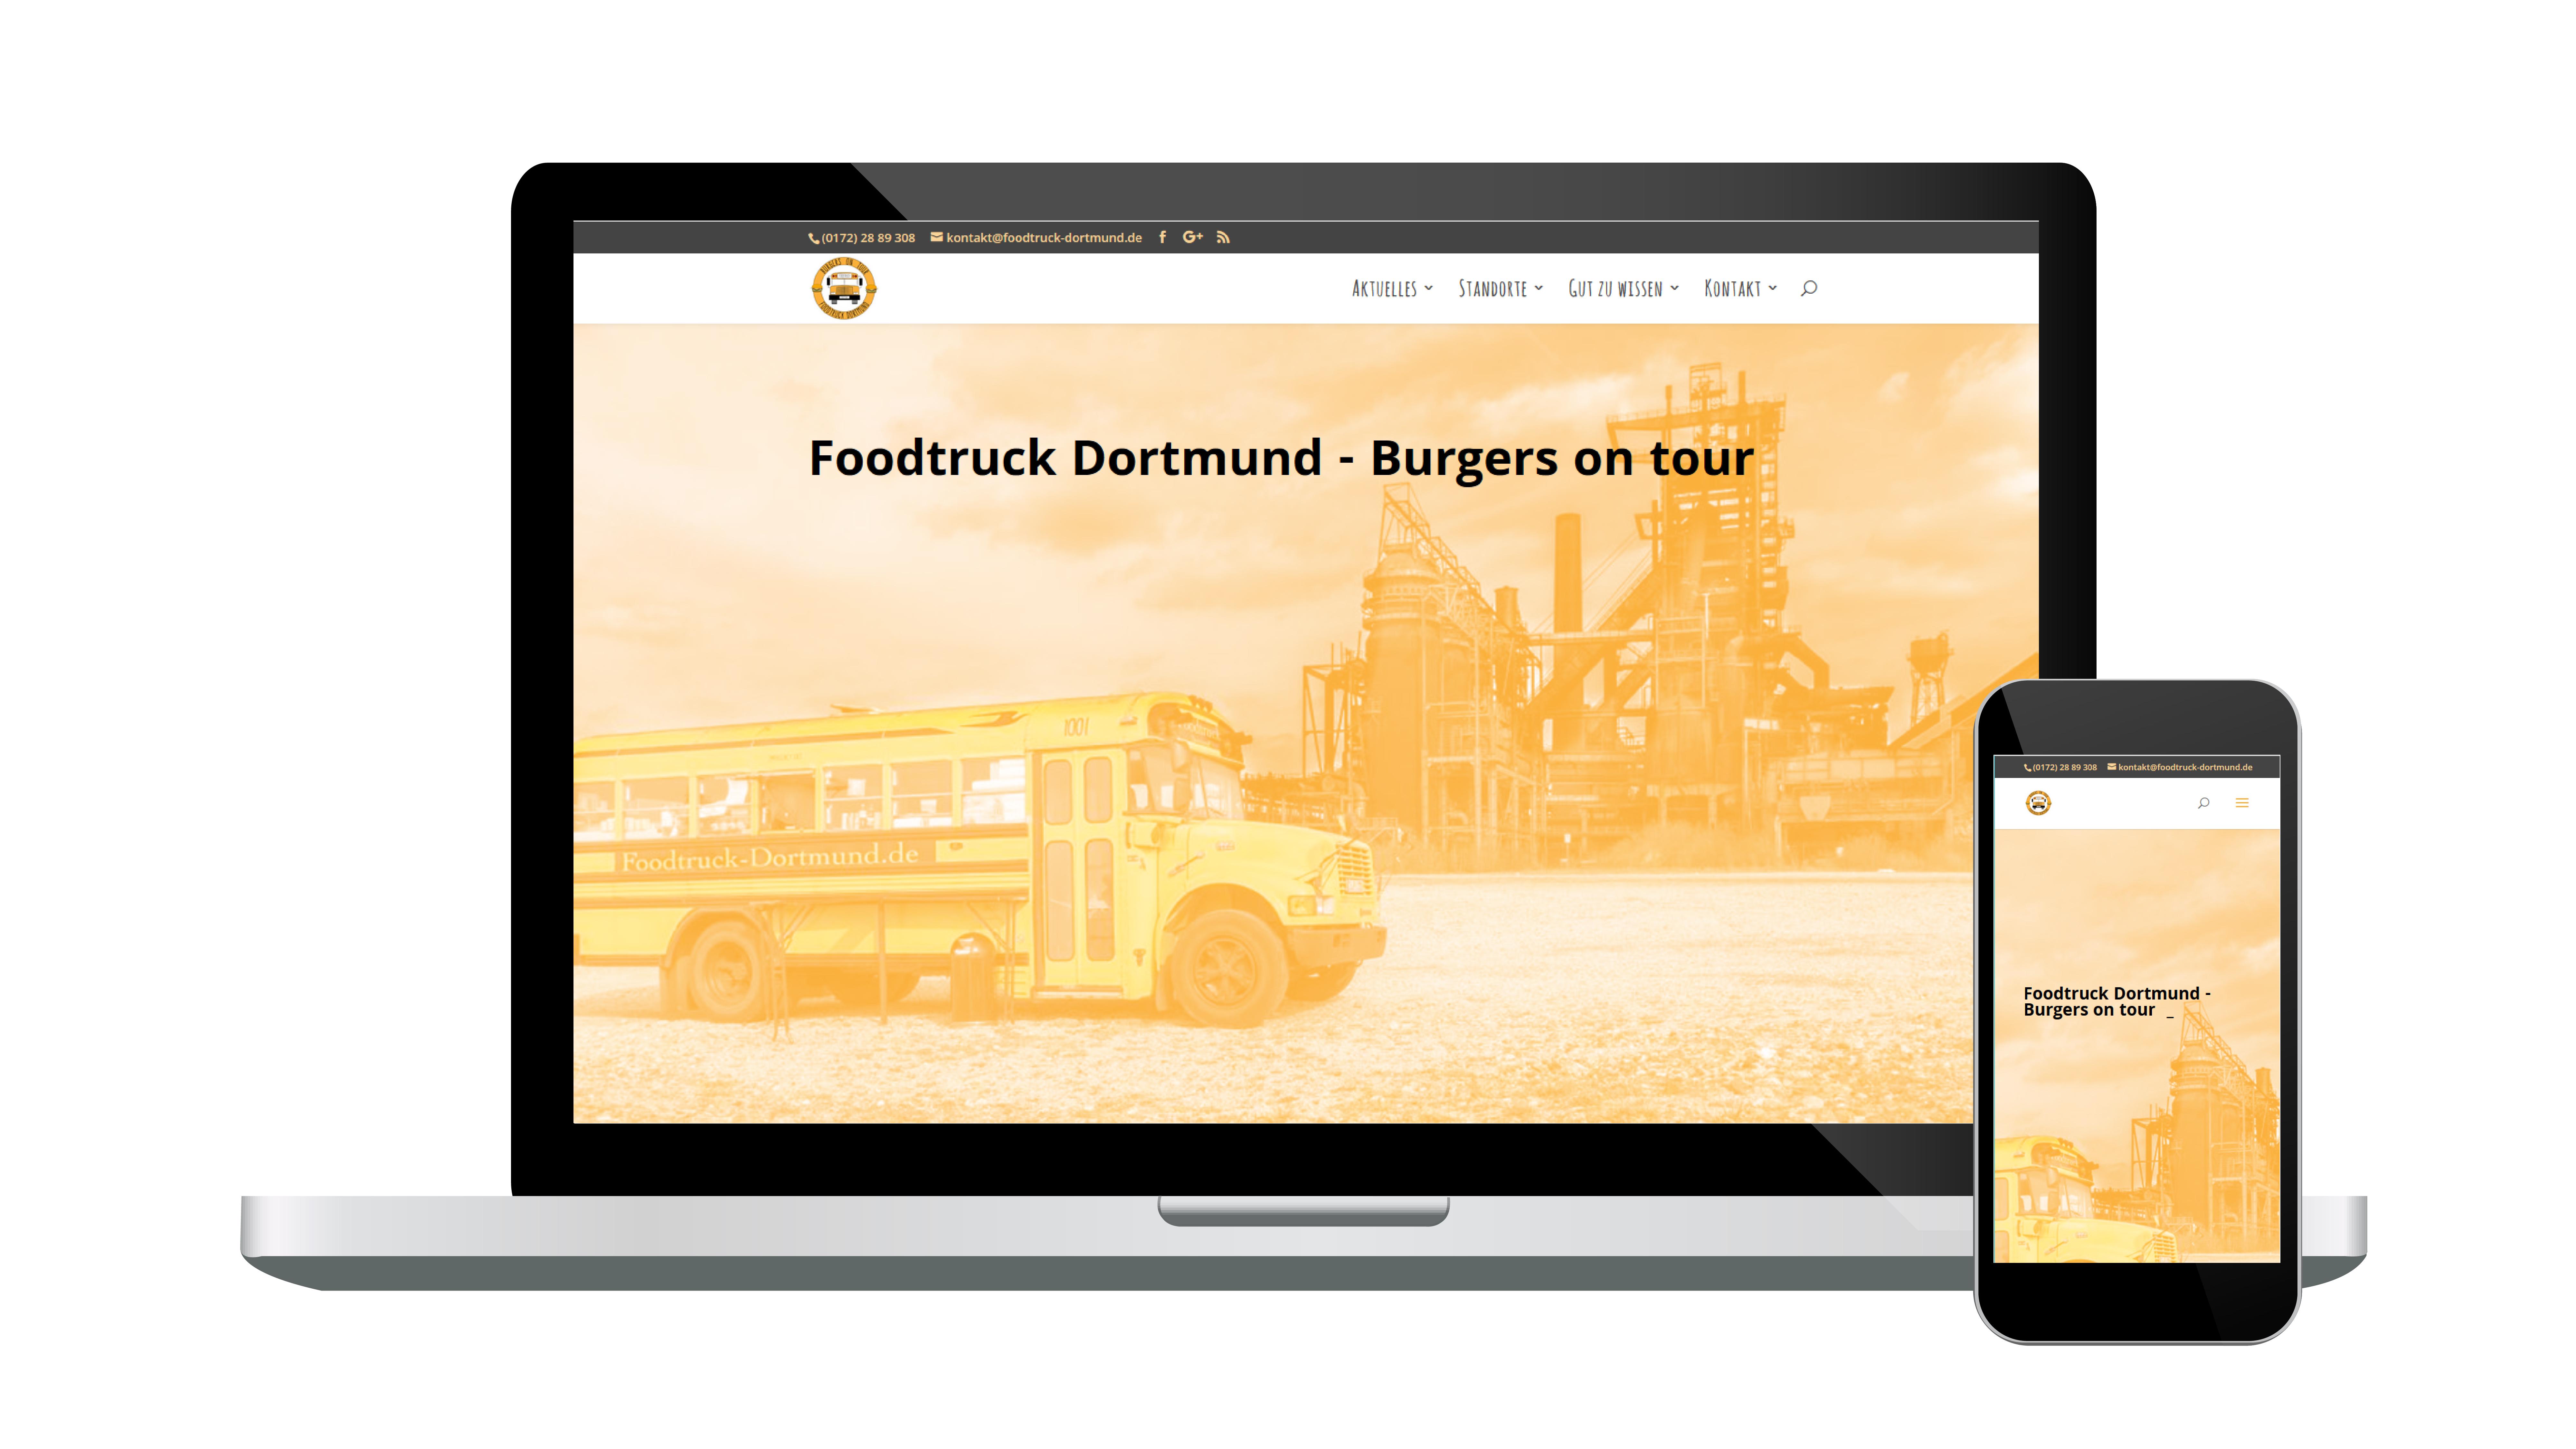 foodtruck dortmund kirsten deggim marketing design. Black Bedroom Furniture Sets. Home Design Ideas